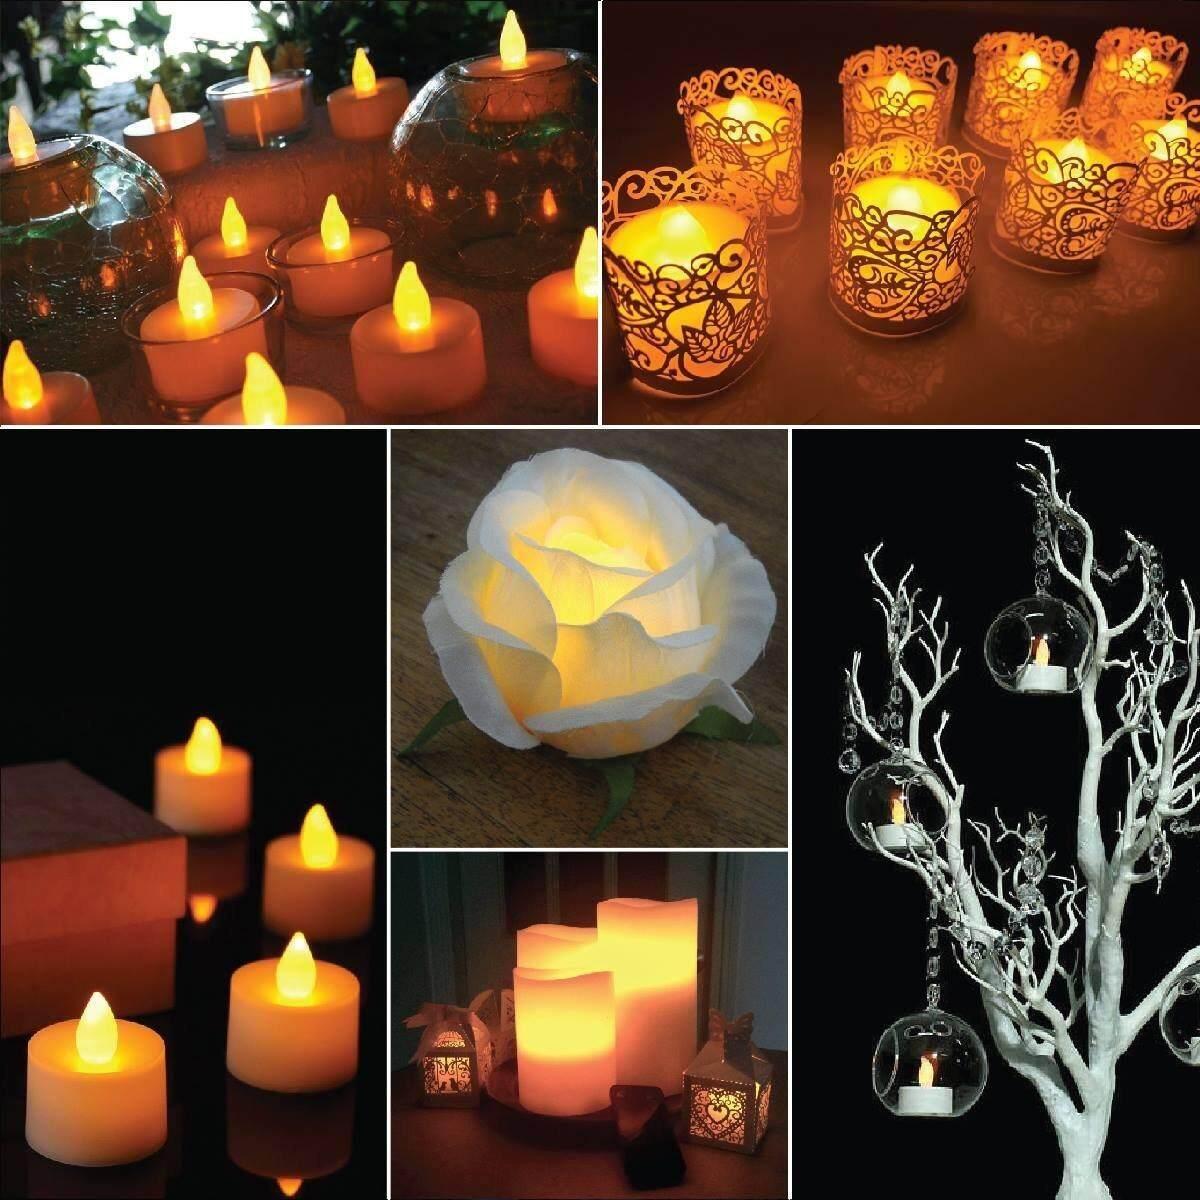 24PCS Electronic Candle Light Romantic Lamp Flameless Tealight Candles Wedding Party Yard Decoration .